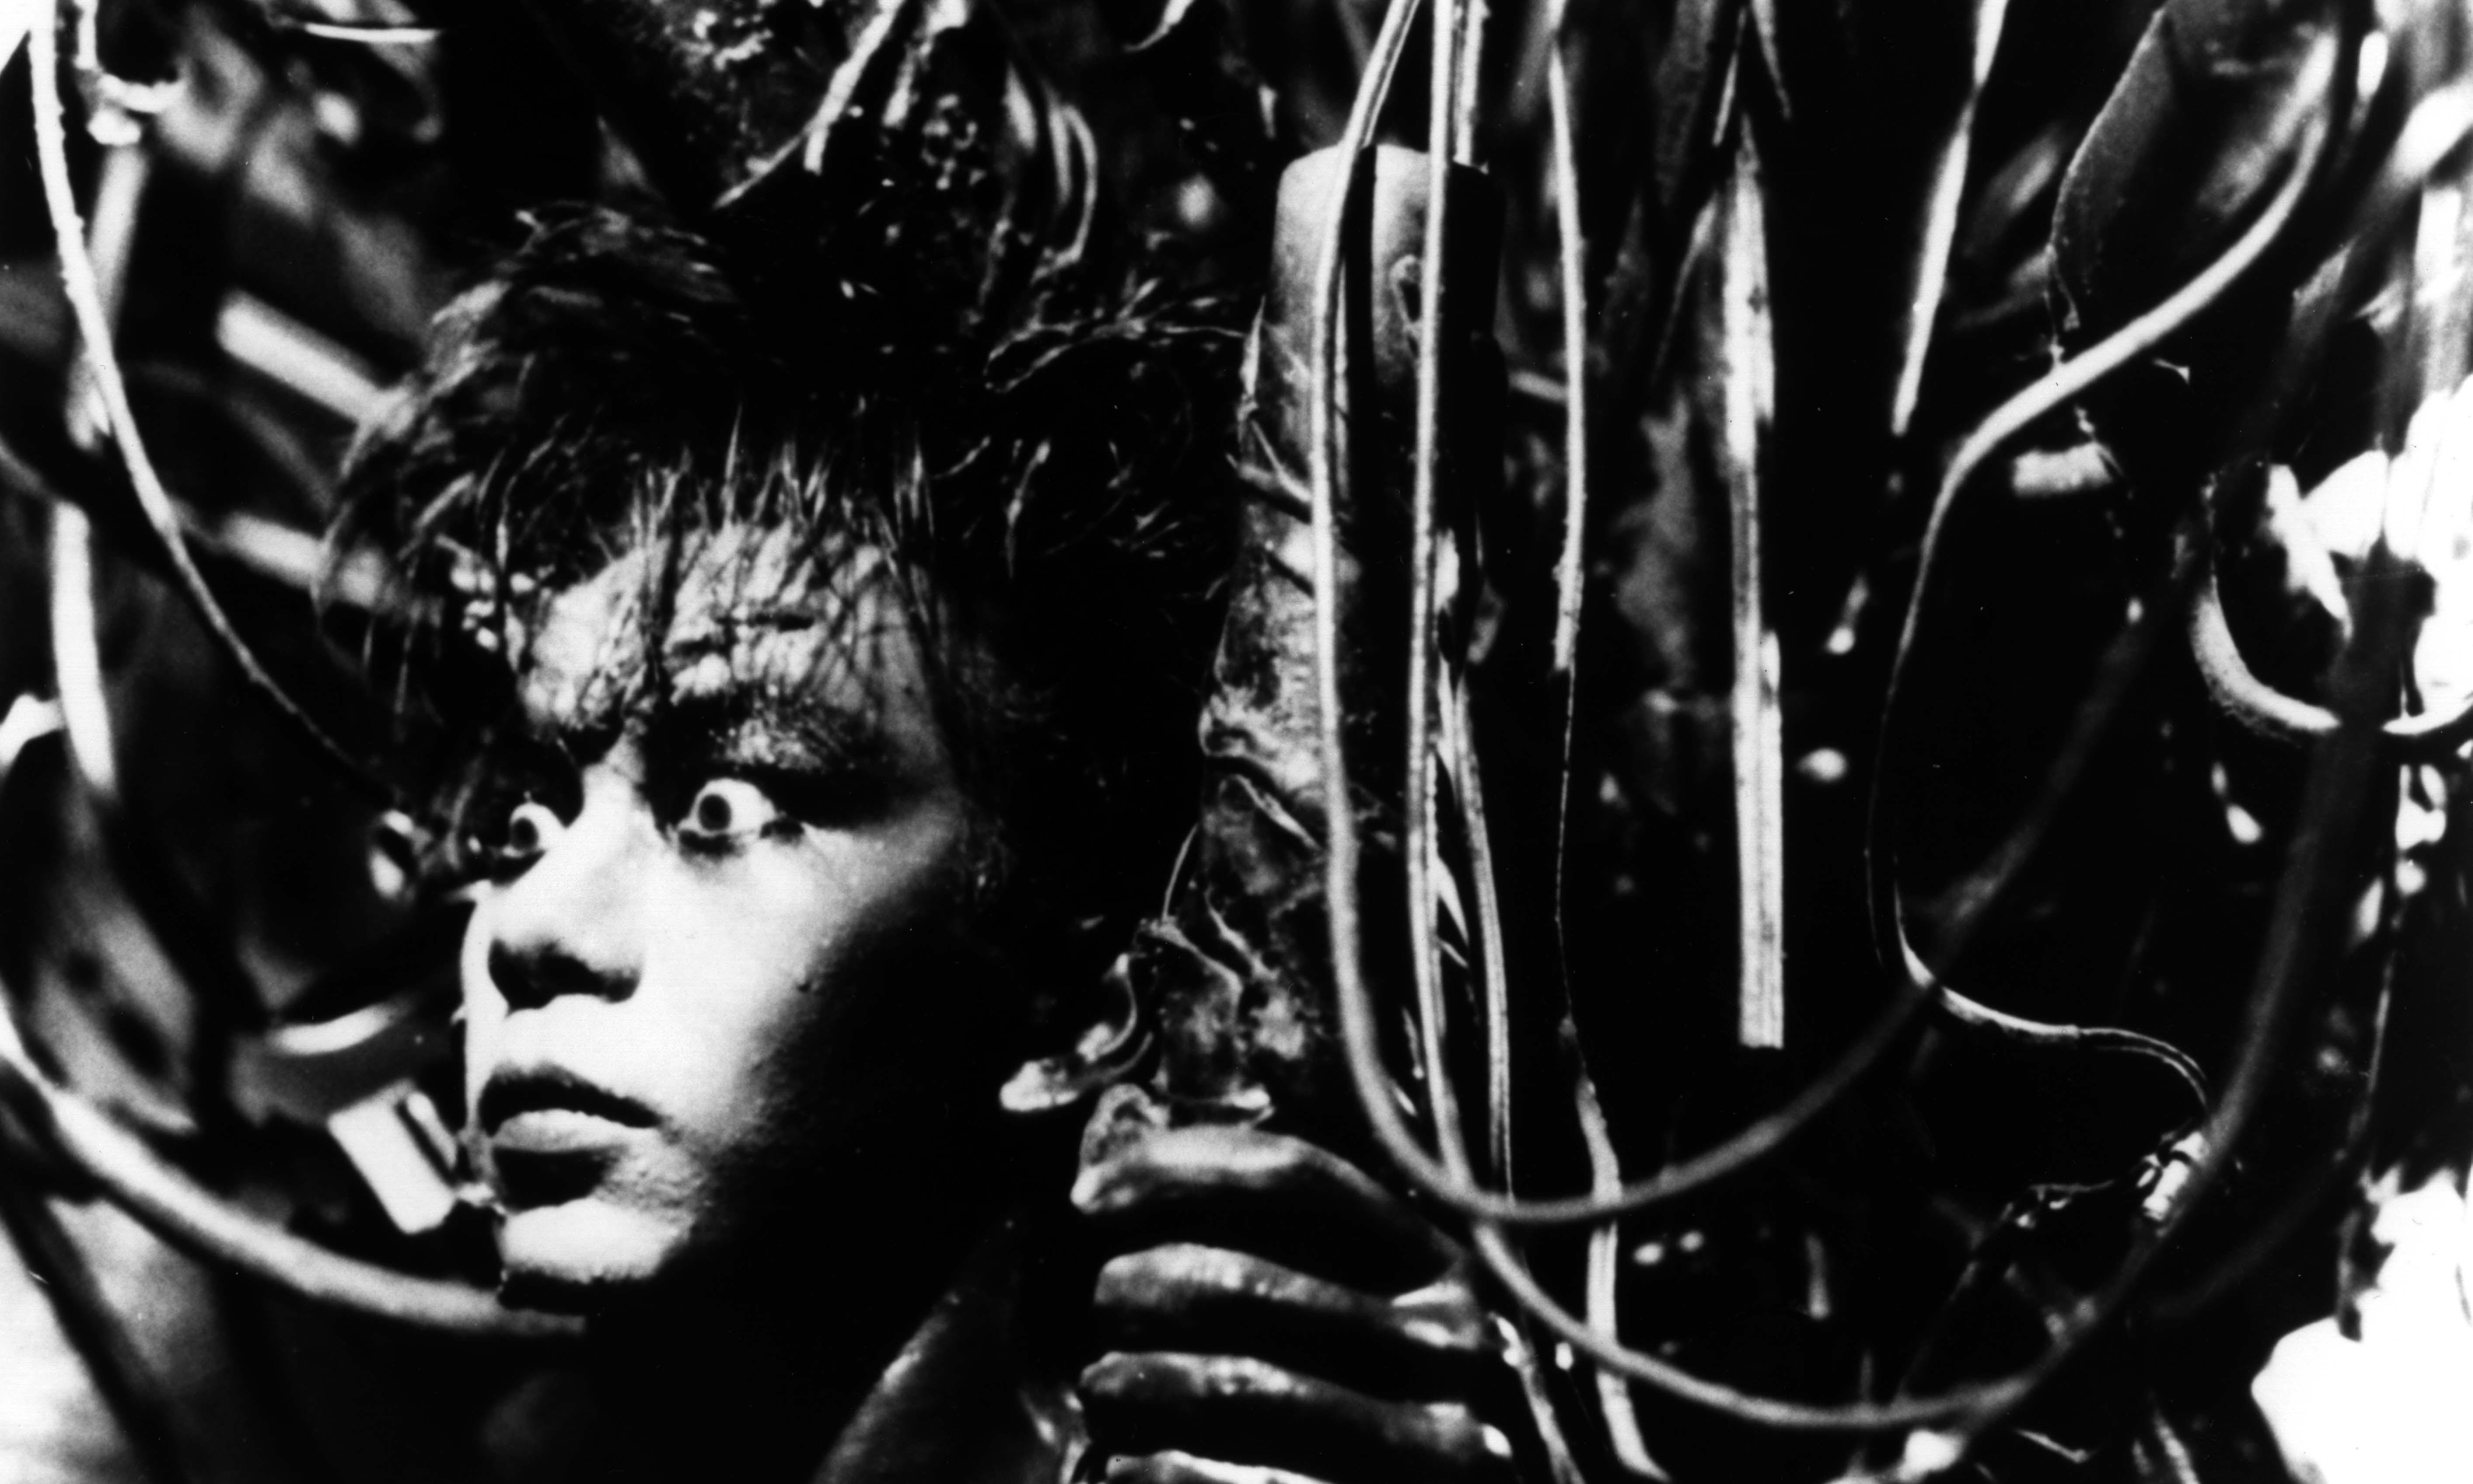 Top 20 J-horror films – ranked!